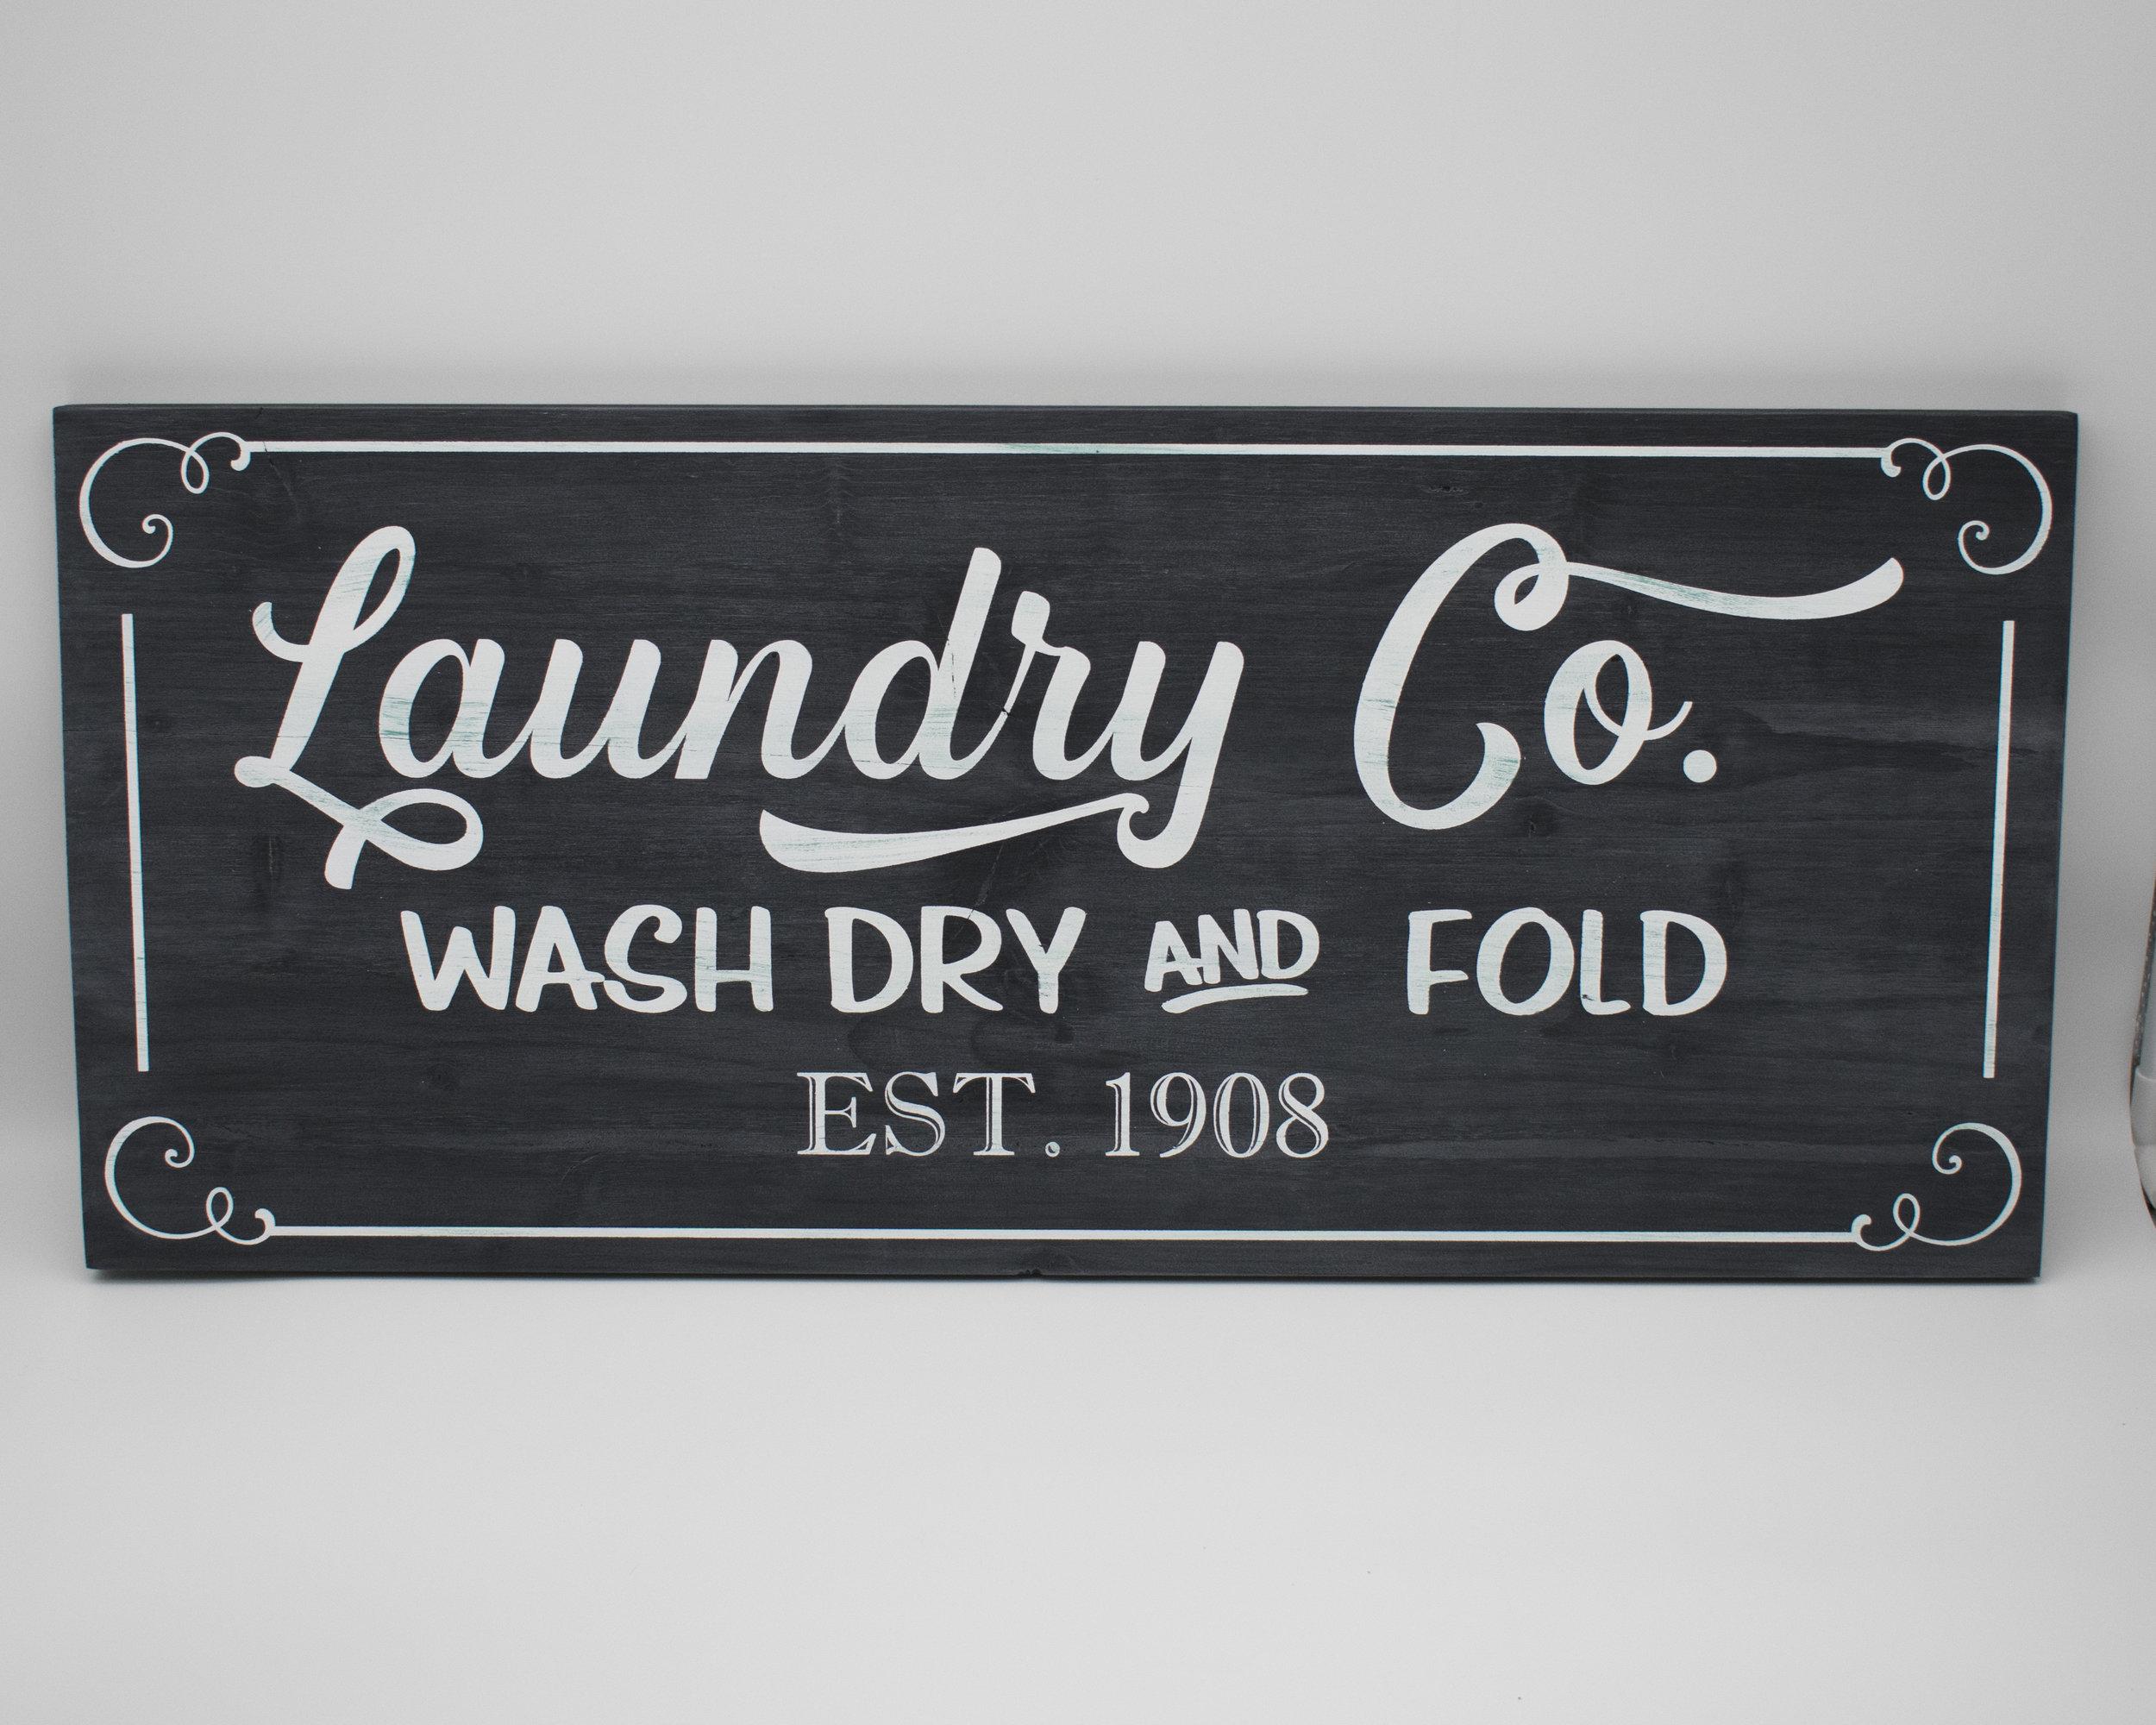 laundry co.jpg